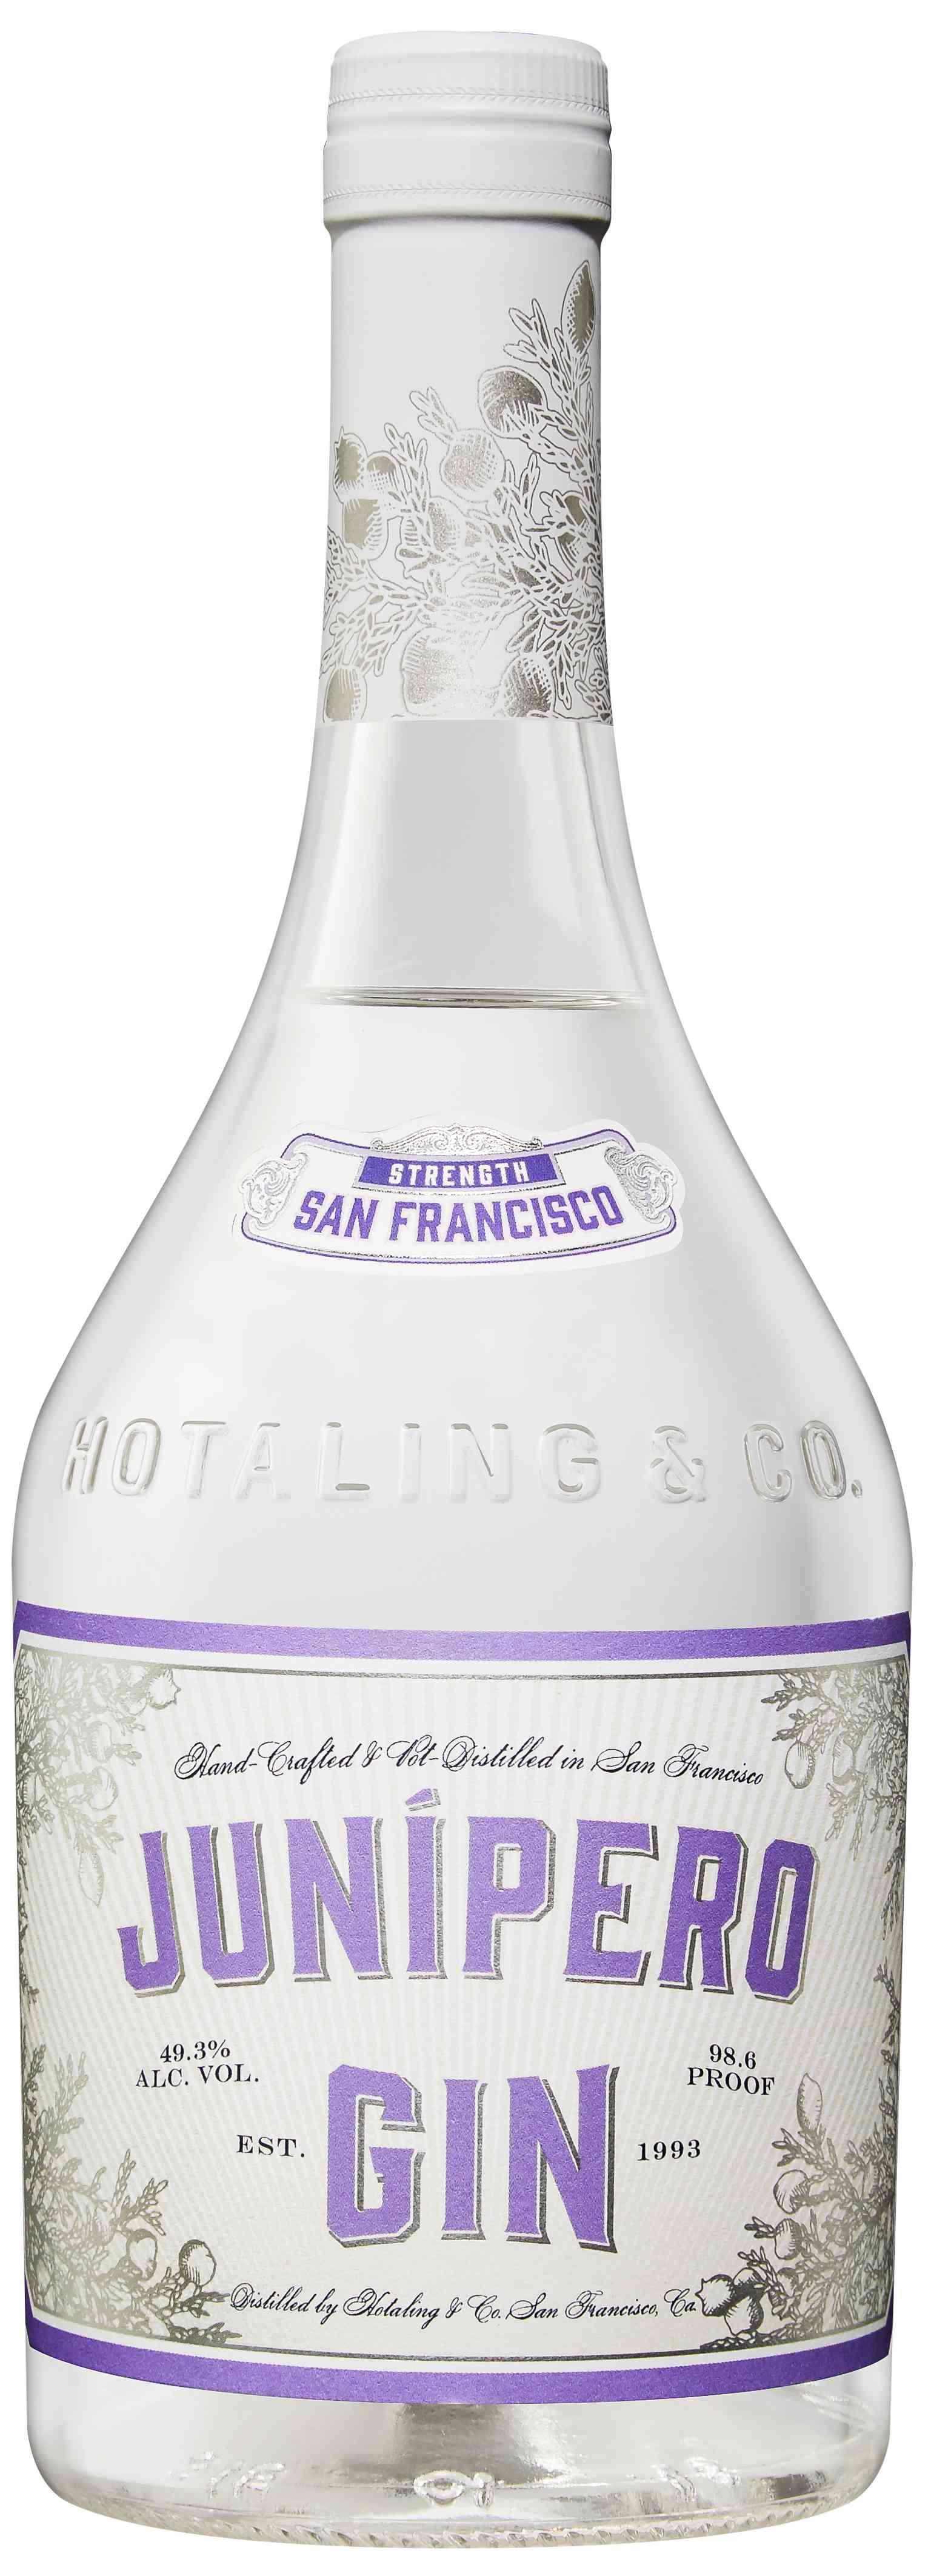 Bottle of Hotaling & Co. Junípero Gin